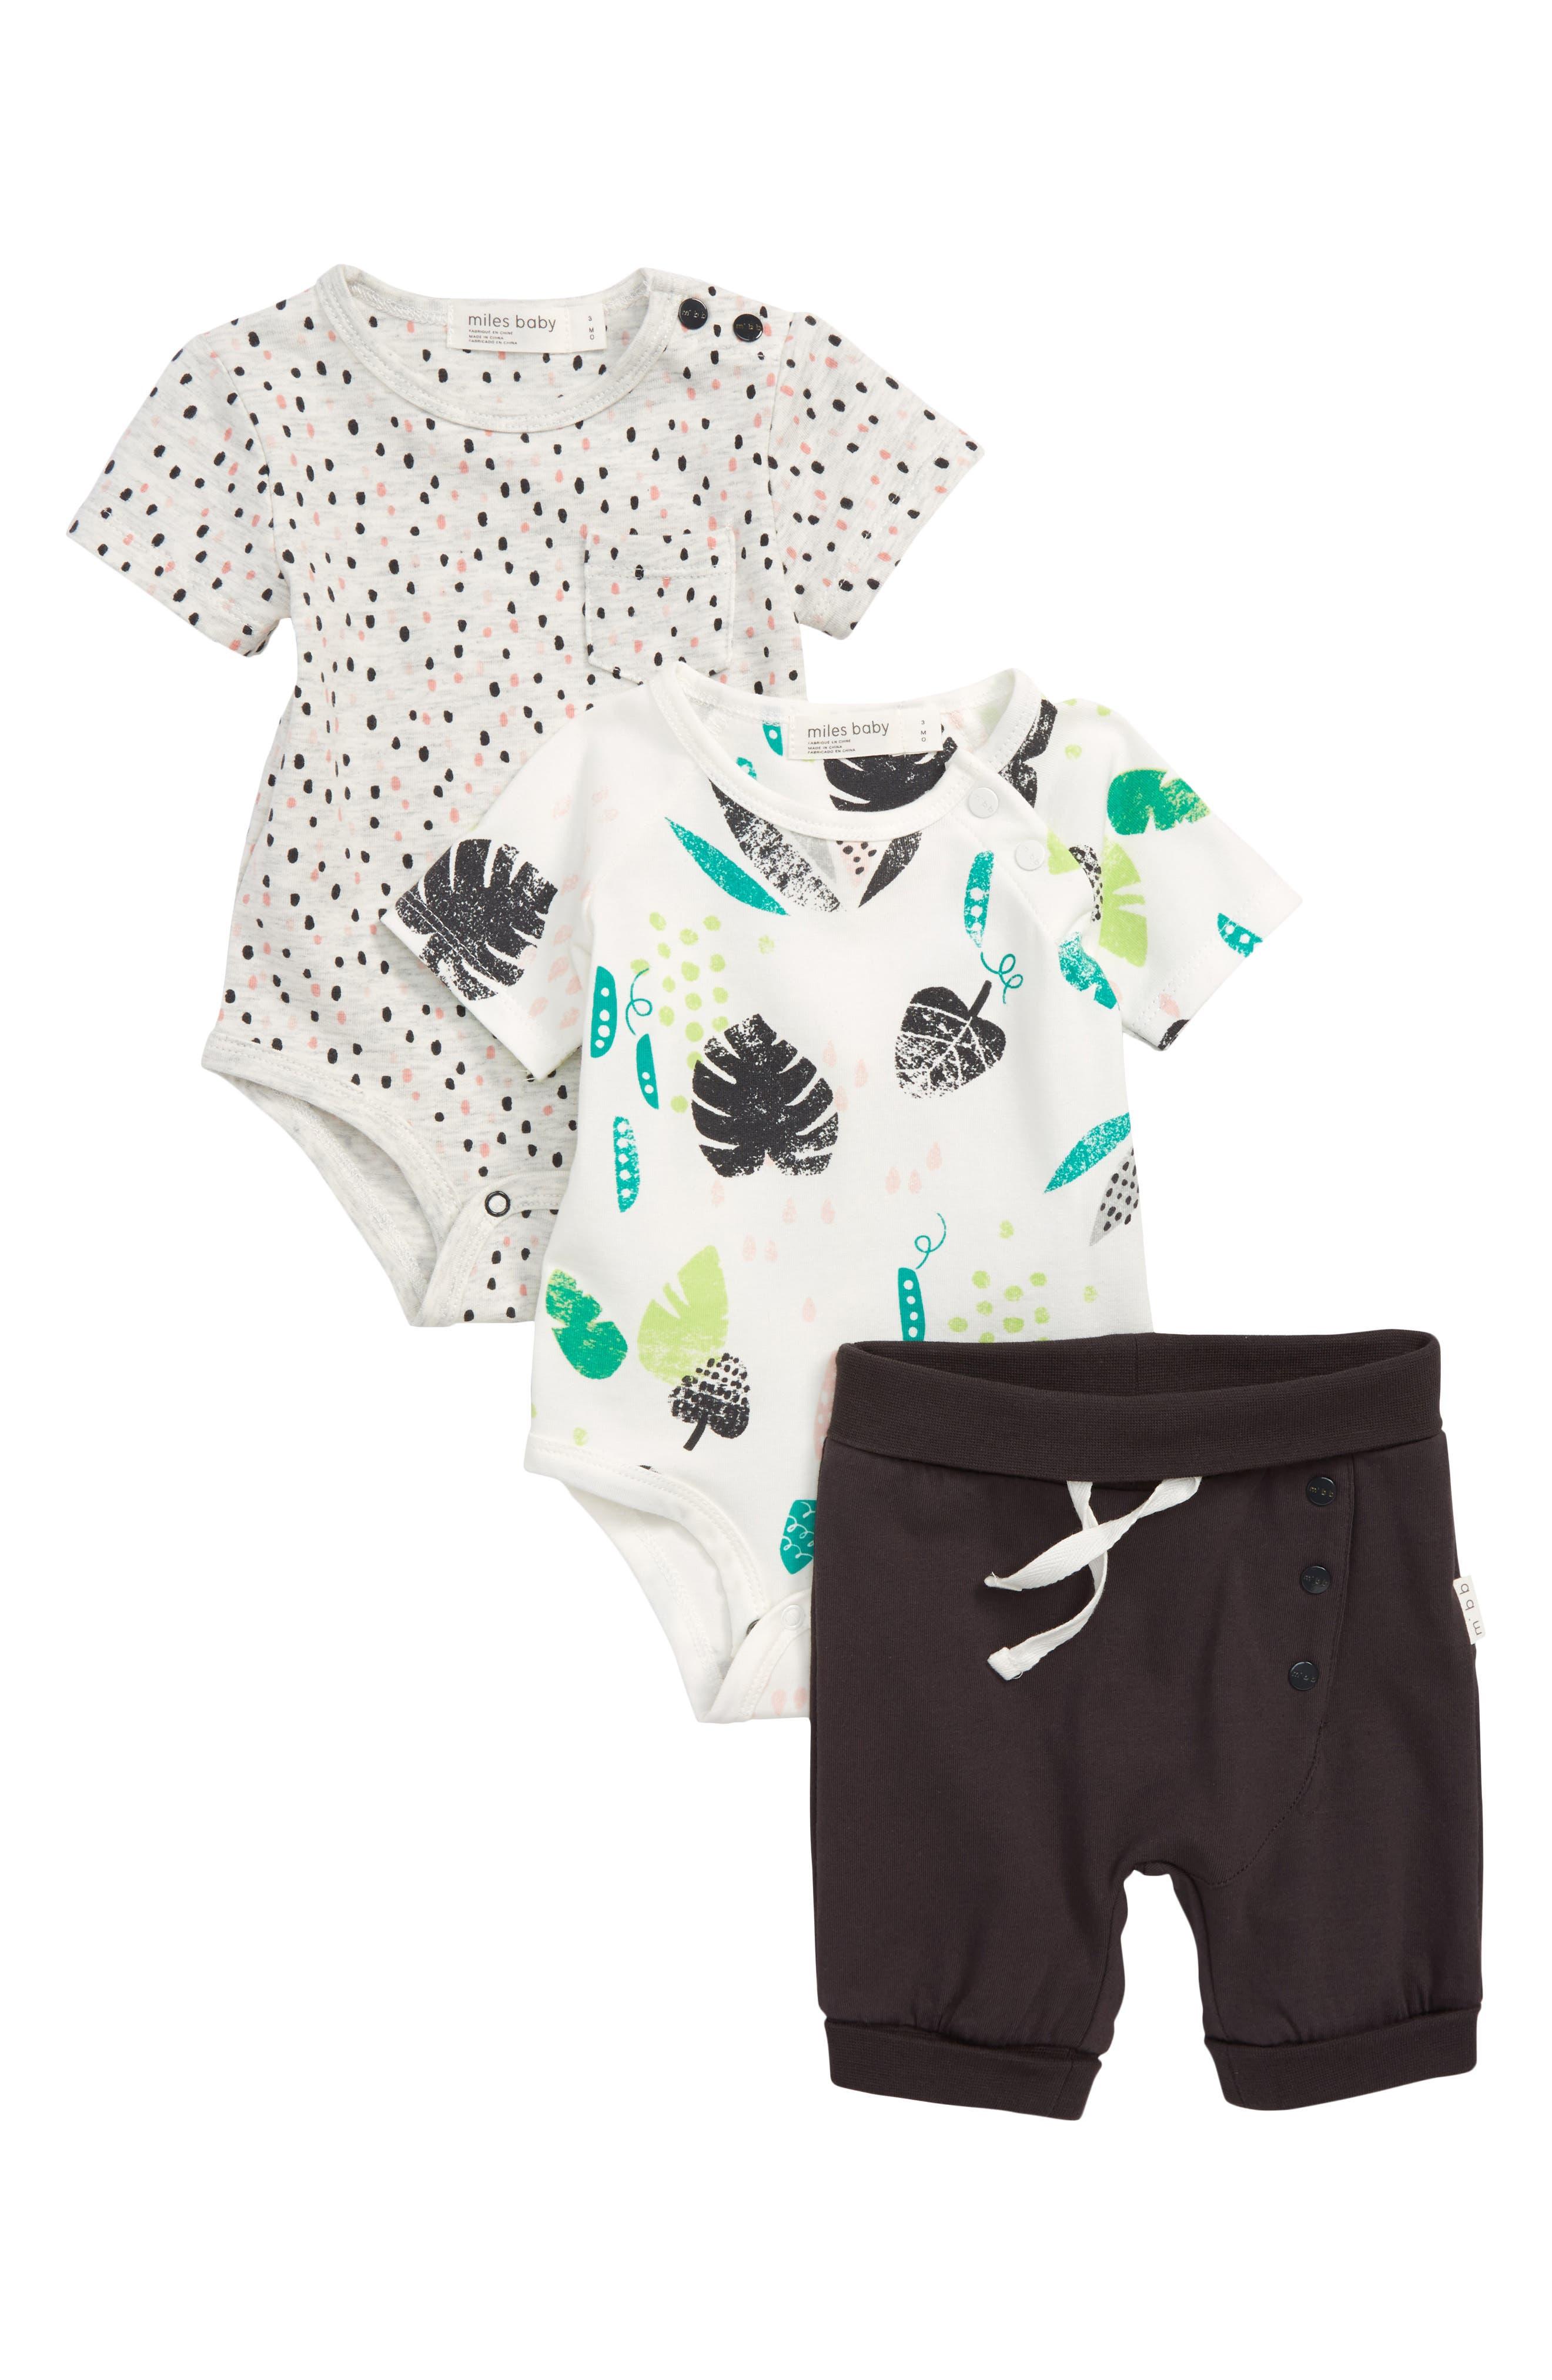 Miles Baby 3-Piece Bodysuits & Shorts Set (Baby)